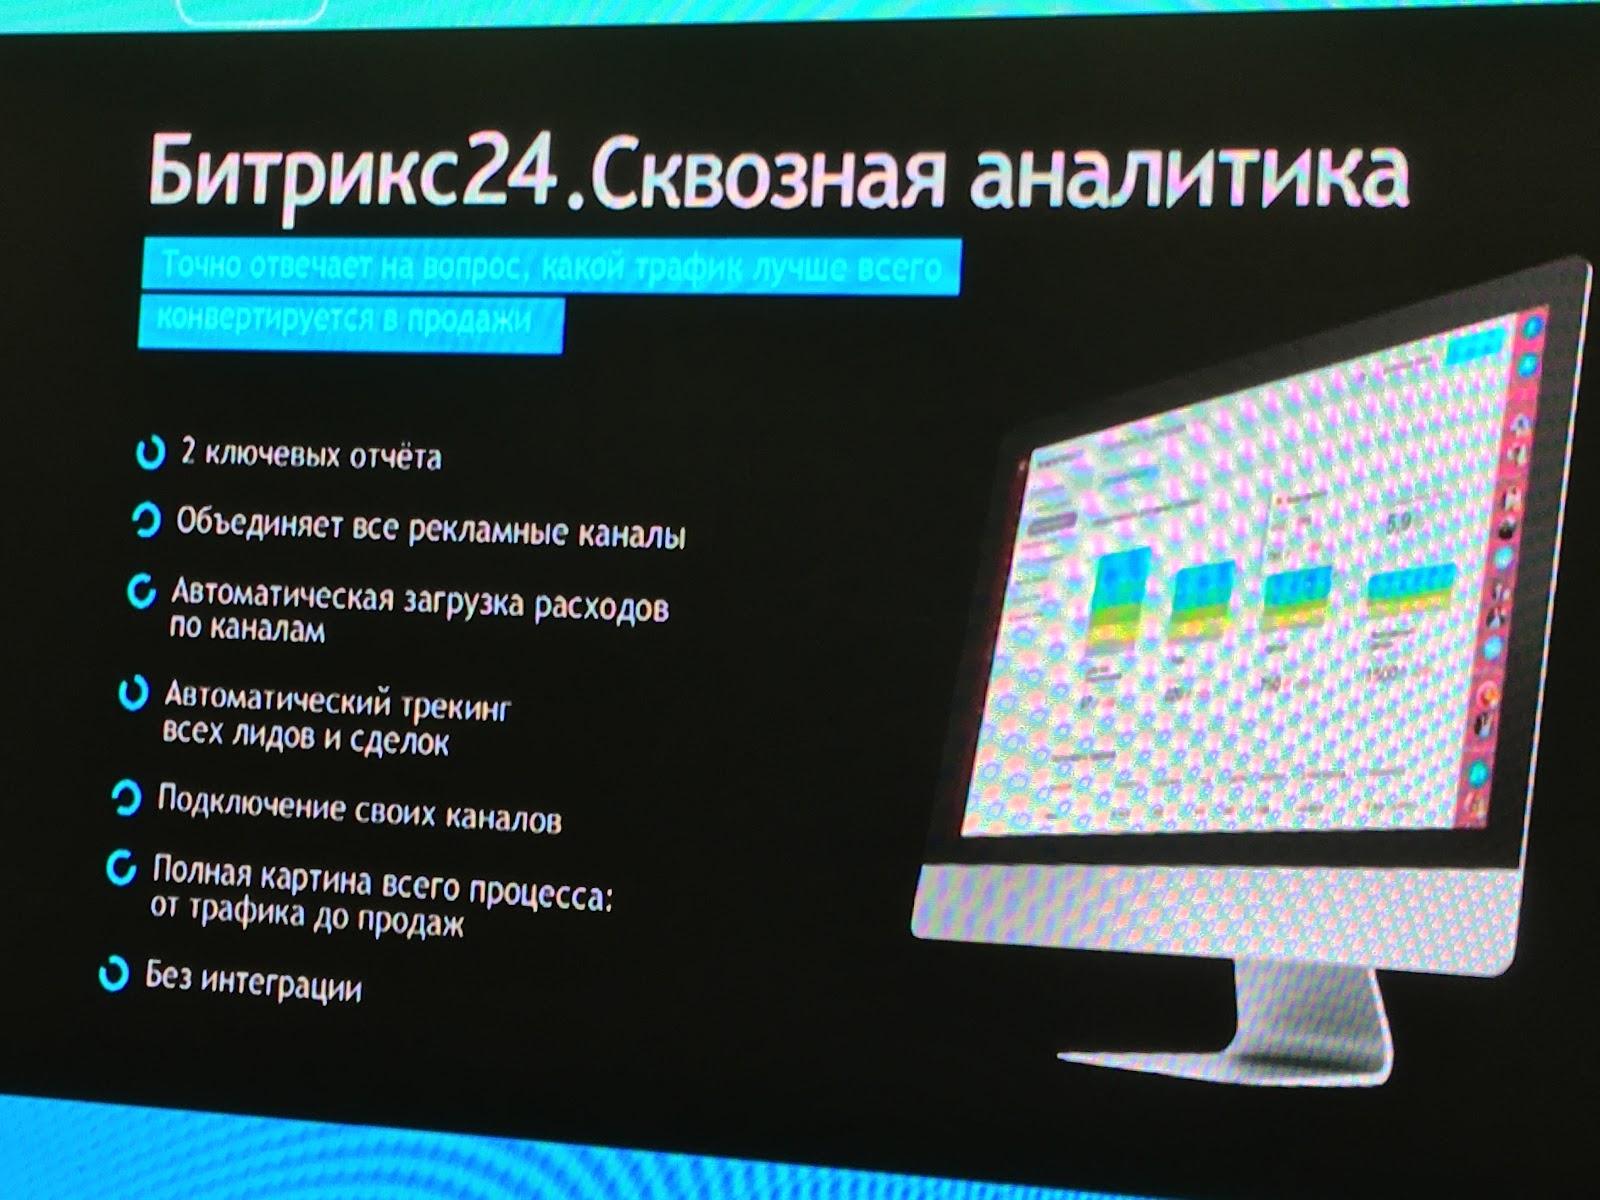 Битрикс24 Сквозная аналитика